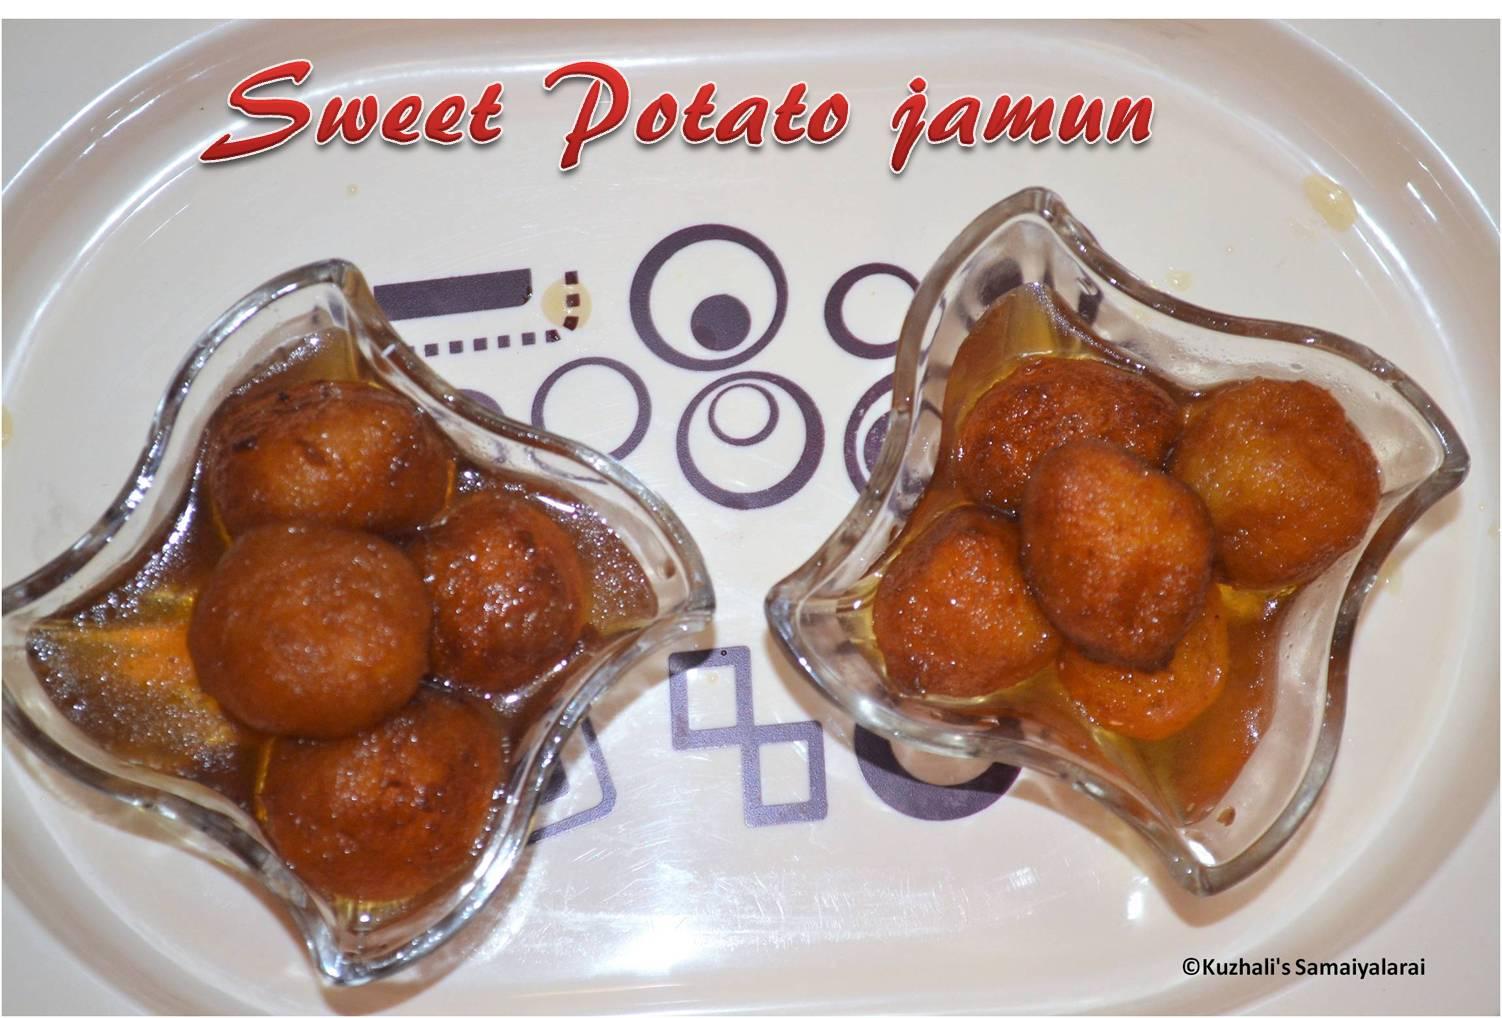 http://www.kuzhalisamaiyalarai.in/2017/03/sweet-potato-gulab-jamun-recipe.html